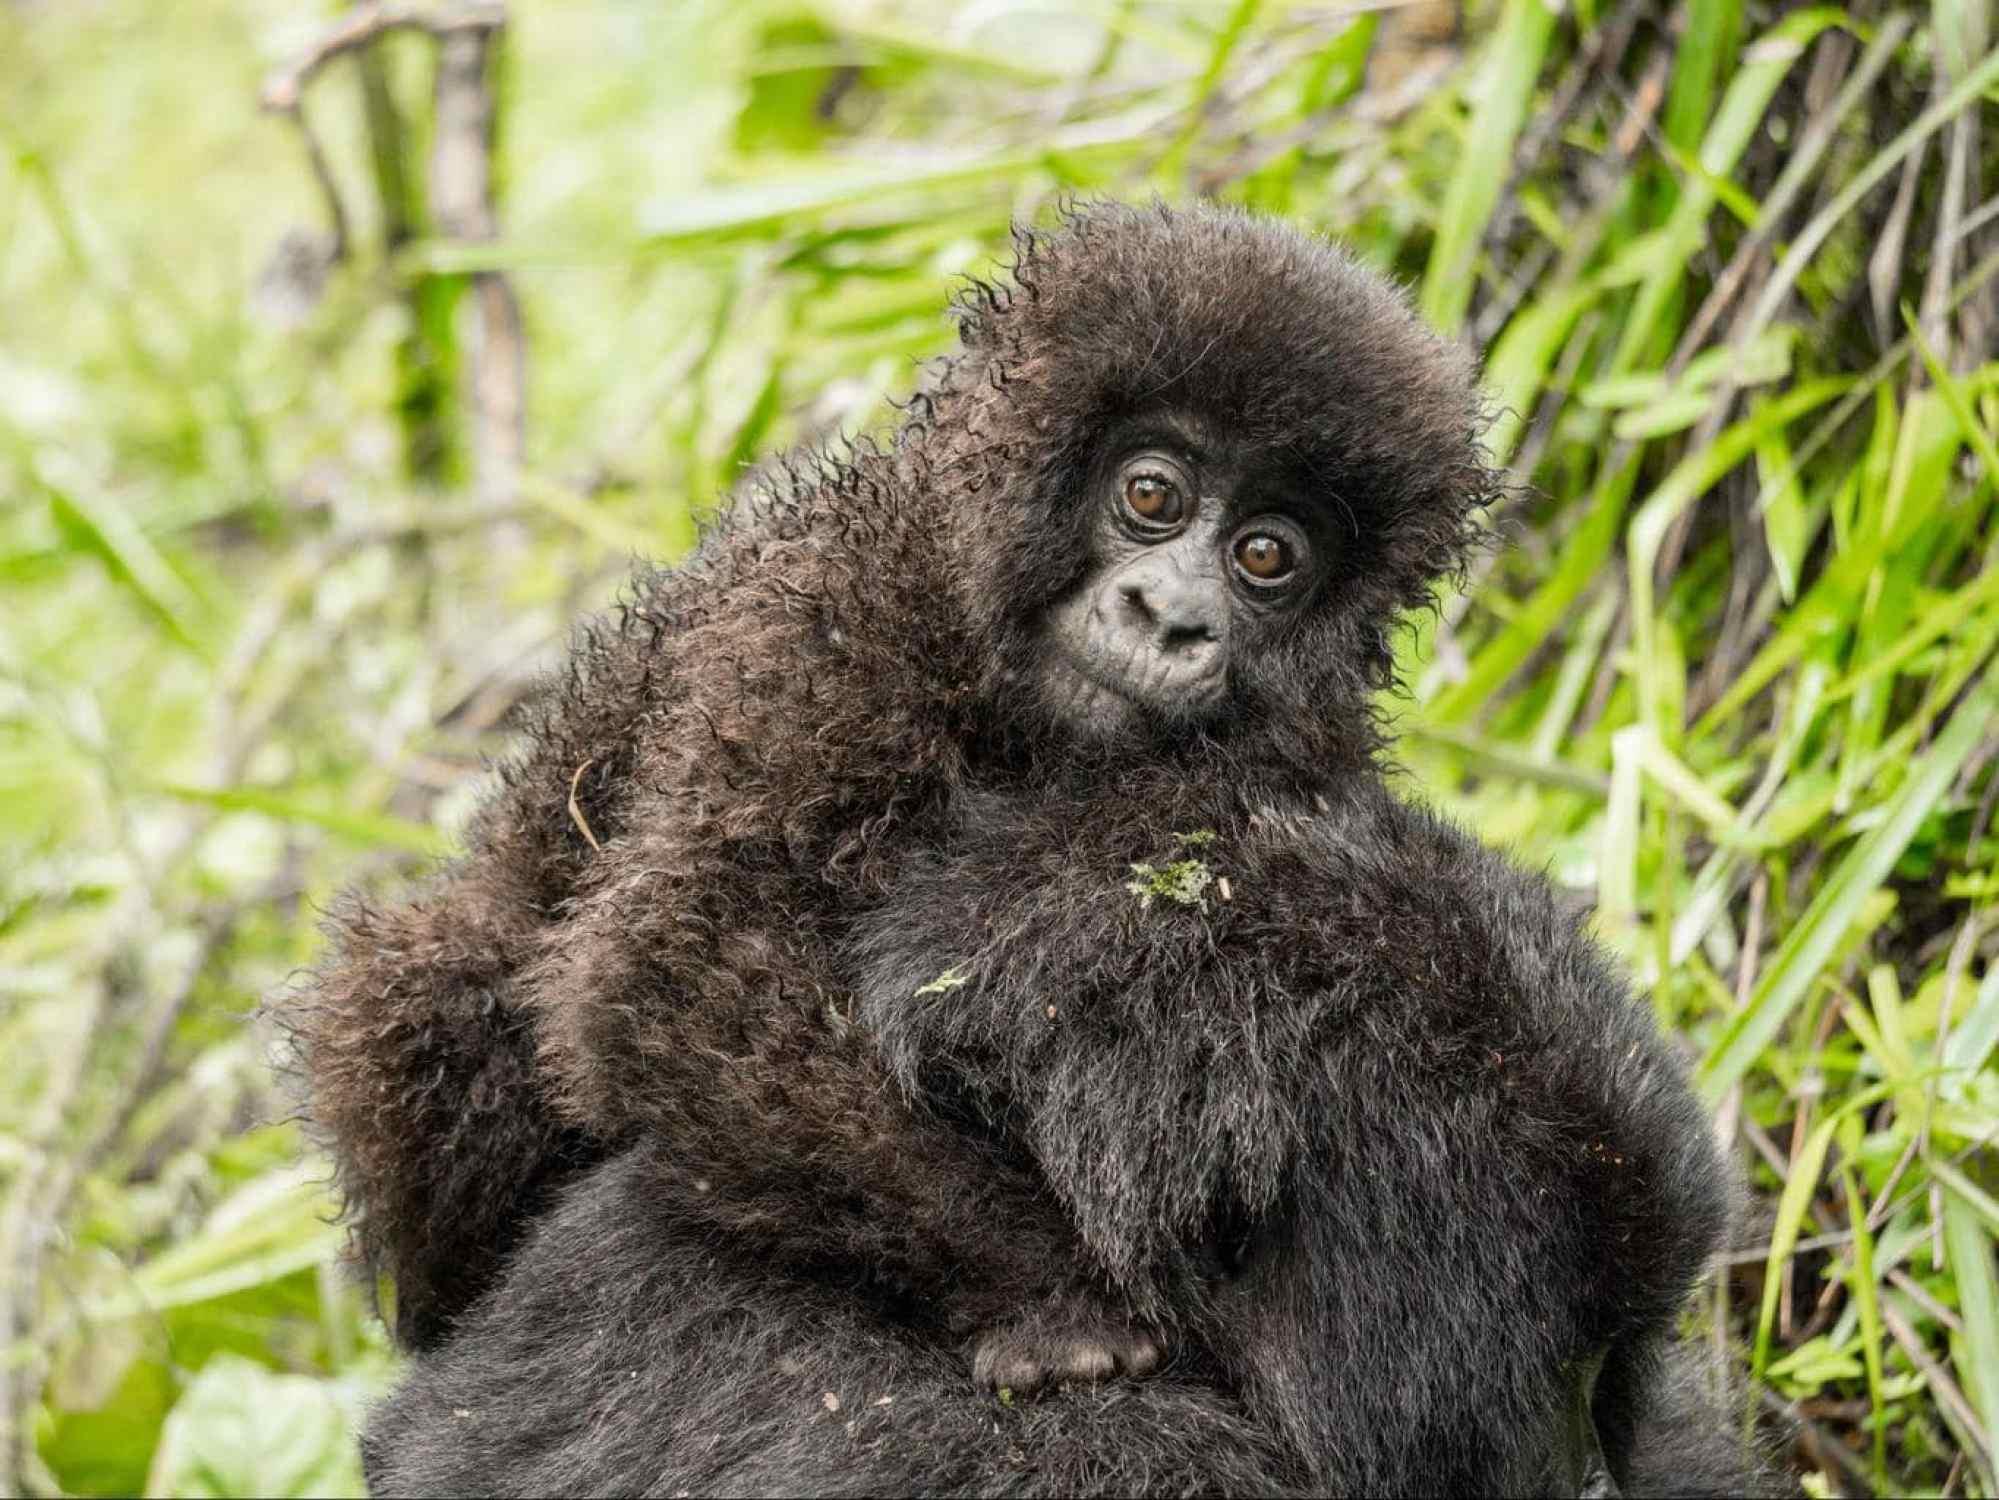 The ball of furry hair of a baby mountain gorilla